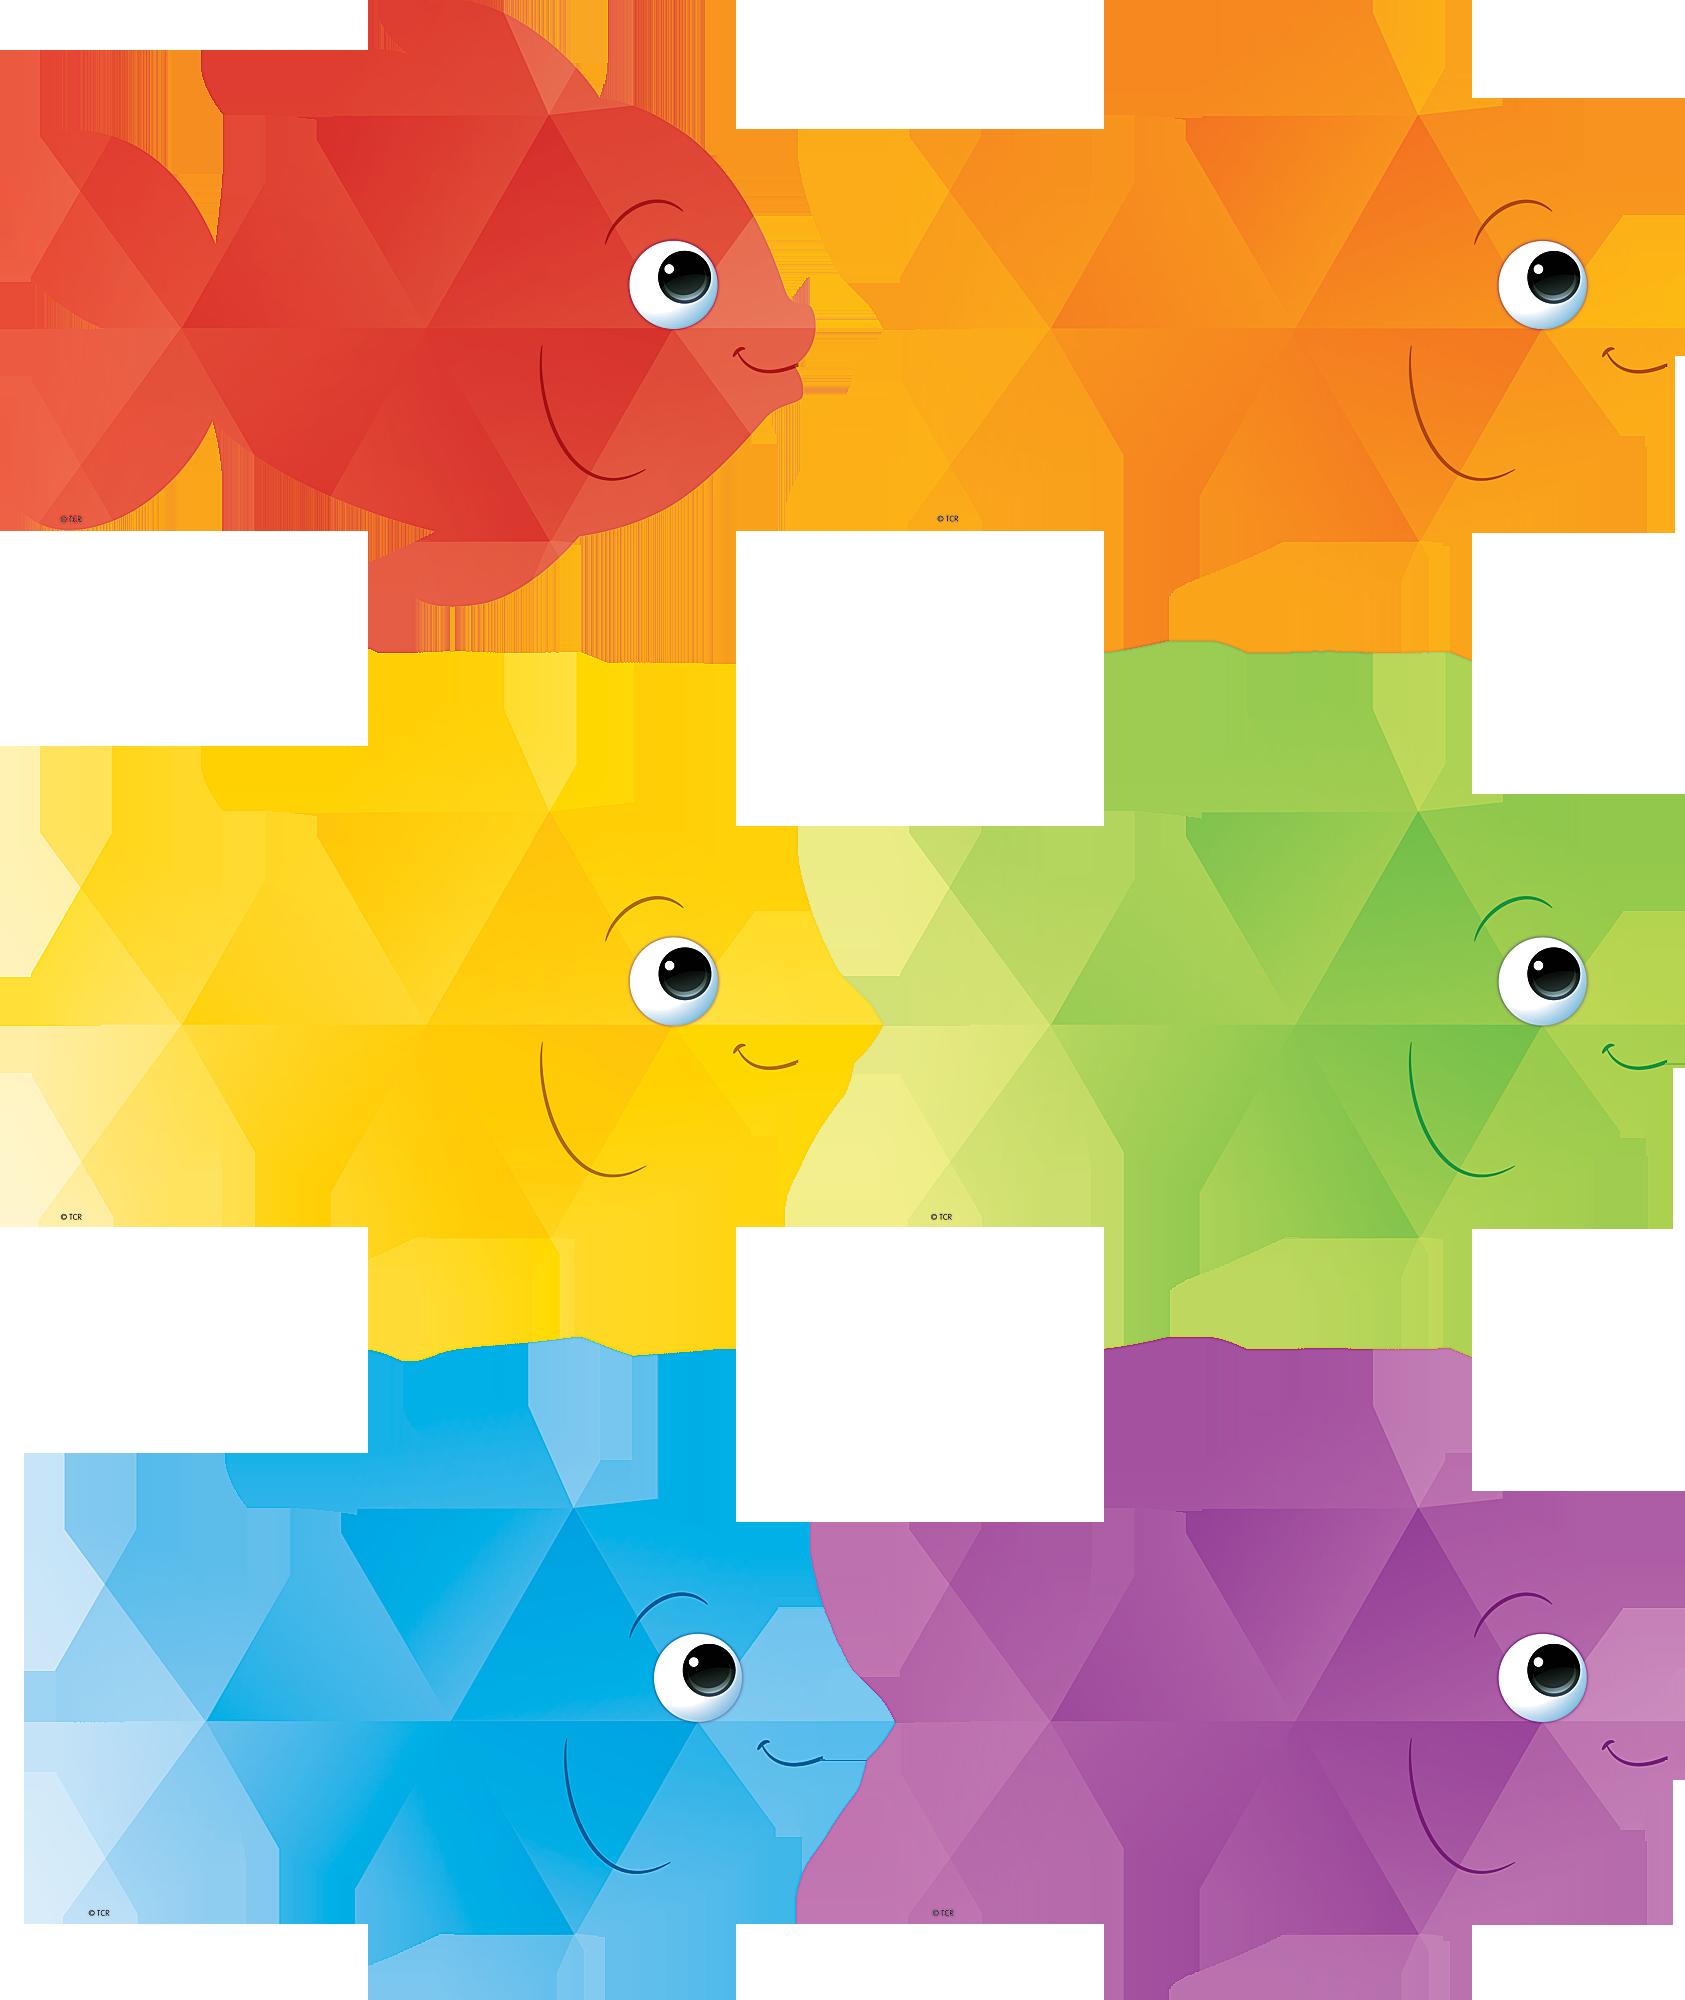 Goldfish clipart 5 fish, Goldfish 5 fish Transparent FREE.